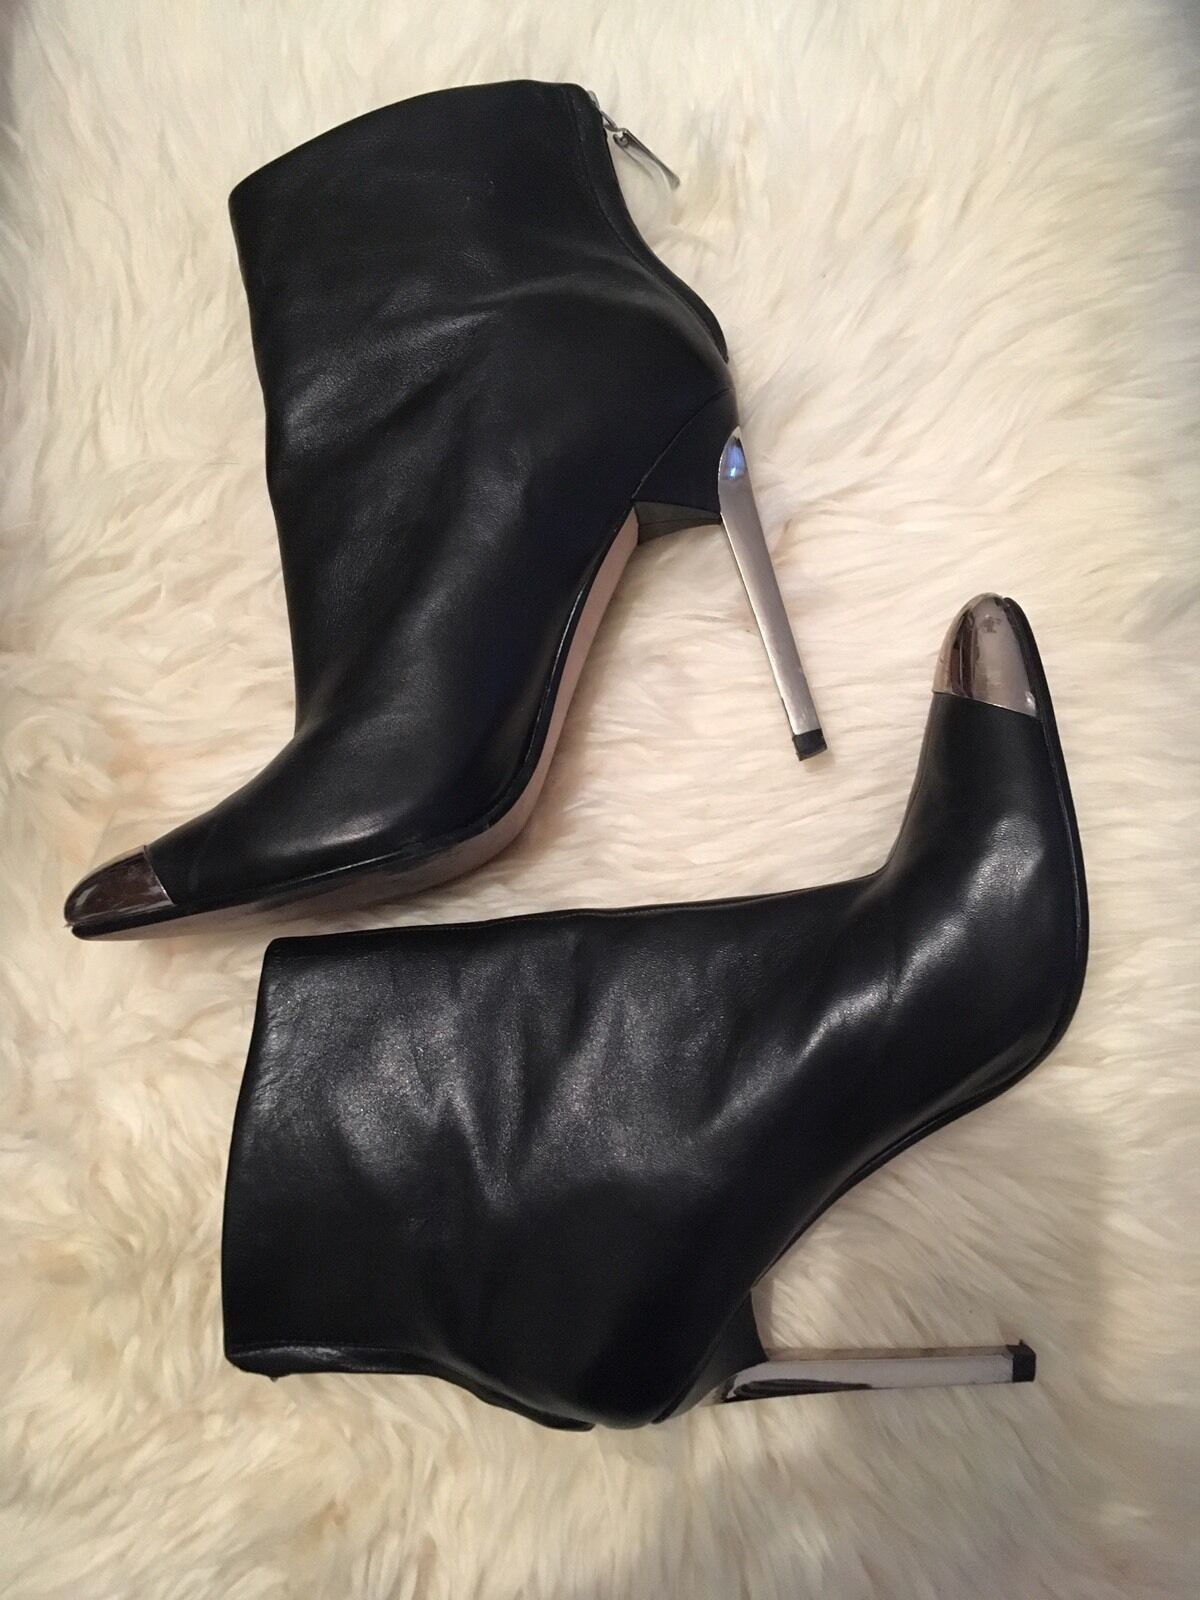 ZARA Woman Leder Stiefelette schwarz High Heel Spitze & Absatz Metall Gr 39 Top